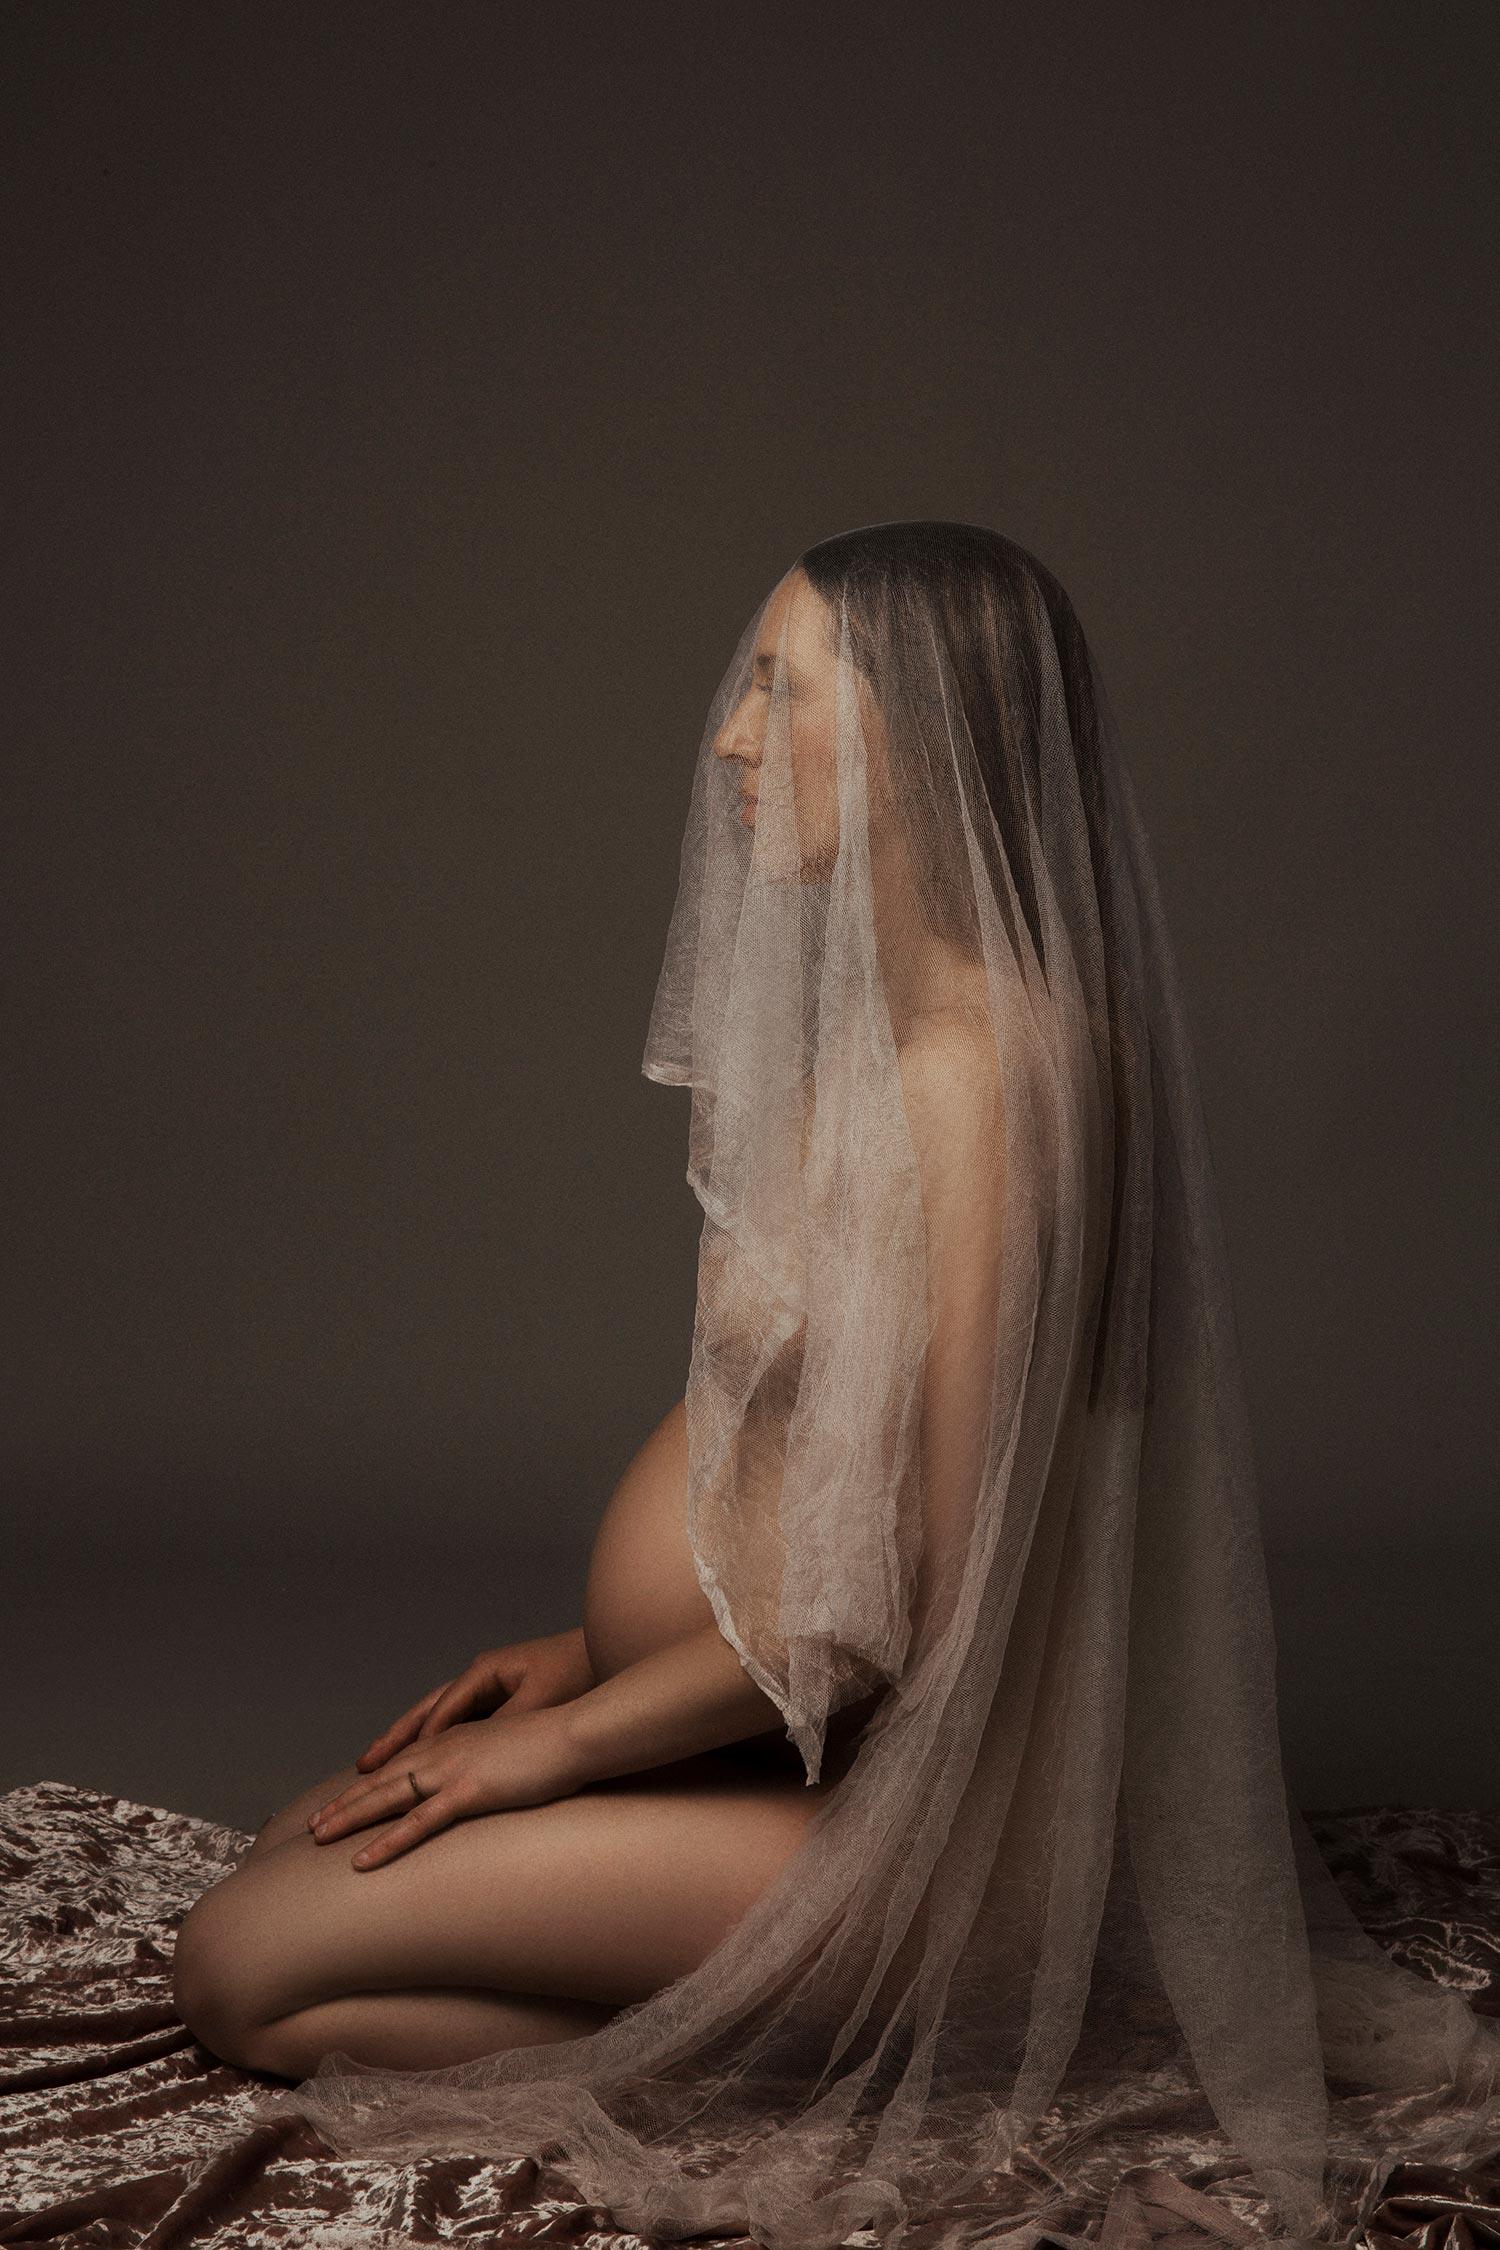 Maternity-Photographer-Thuy-Vo-05.jpg